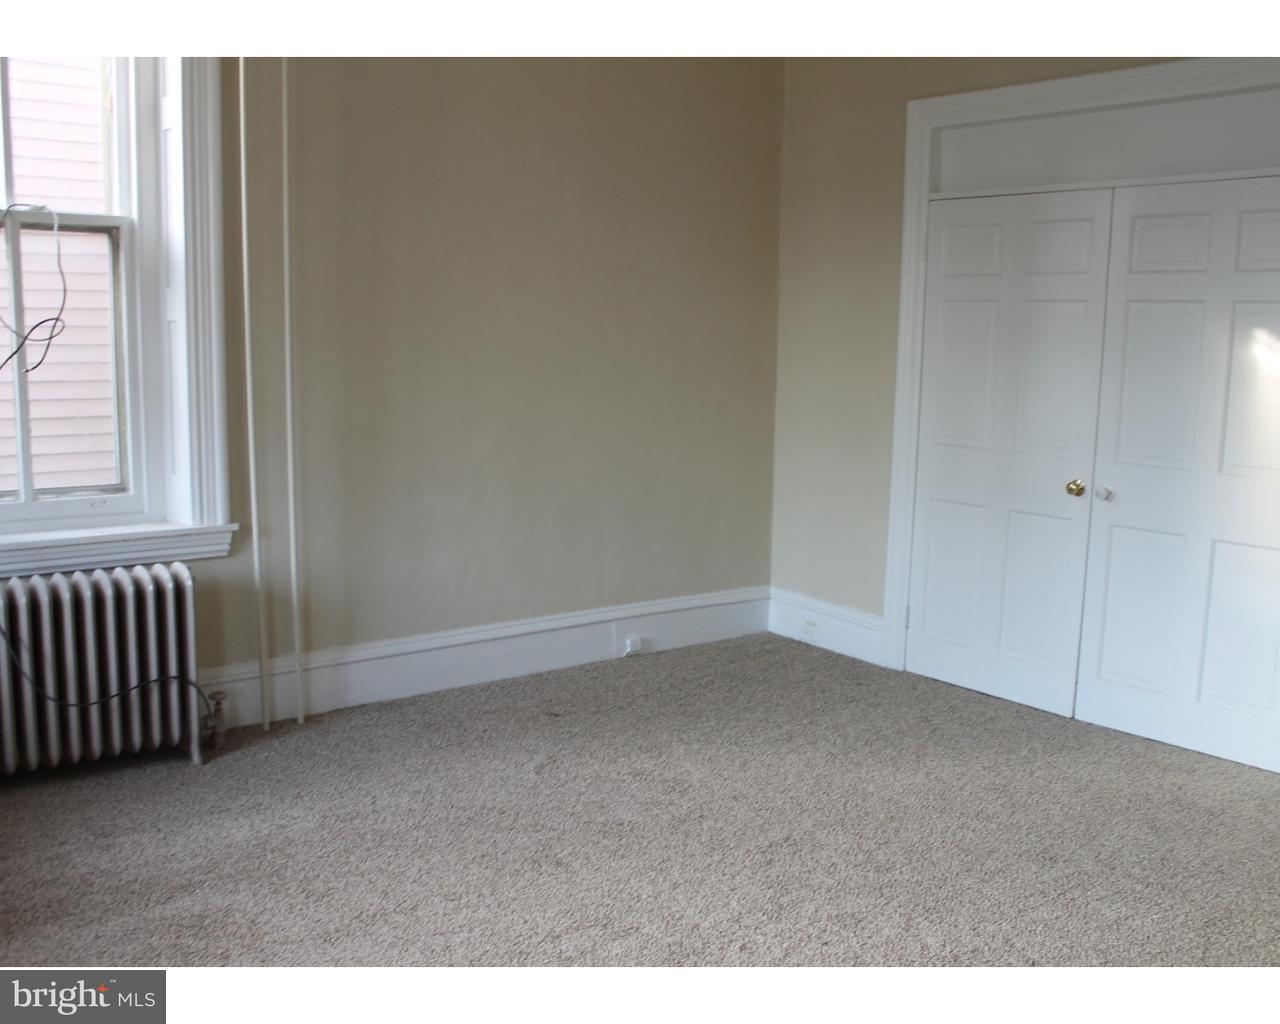 129 N MAIN ST, SELLERSVILLE - Listed at $219,440, SELLERSVILLE